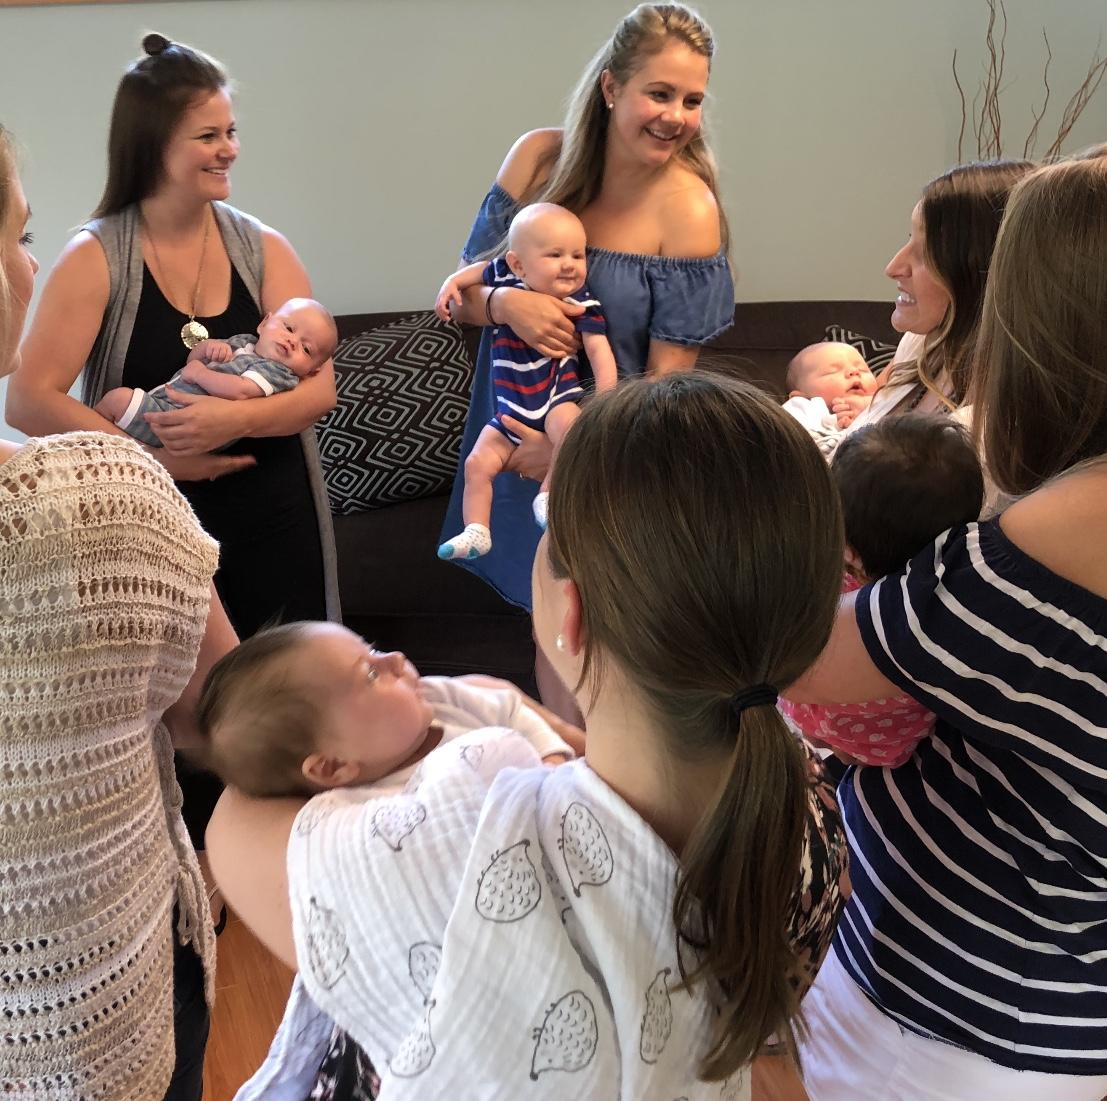 Lab Moms Socializing Aug 2018 (1).jpg